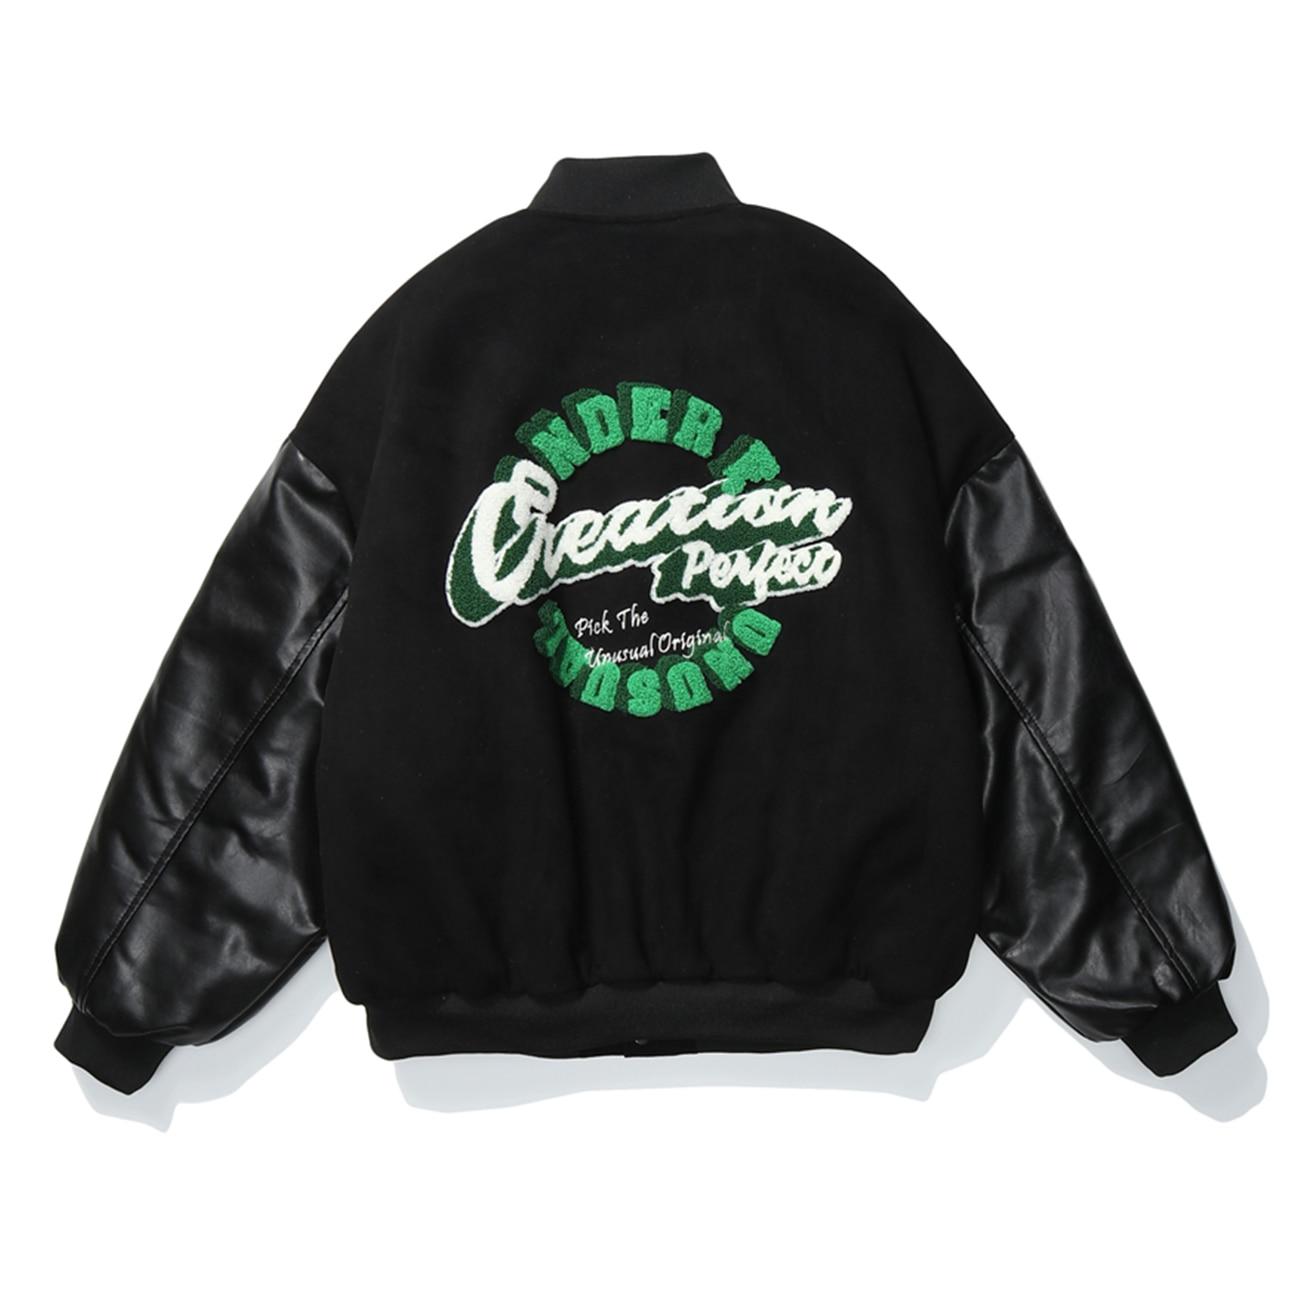 Mens Hip Hop Chamois Suede Thick Jackets Streetwear Baseball Jacket Coats Winter Harajuku Patchwork Bomber Jacket Tops